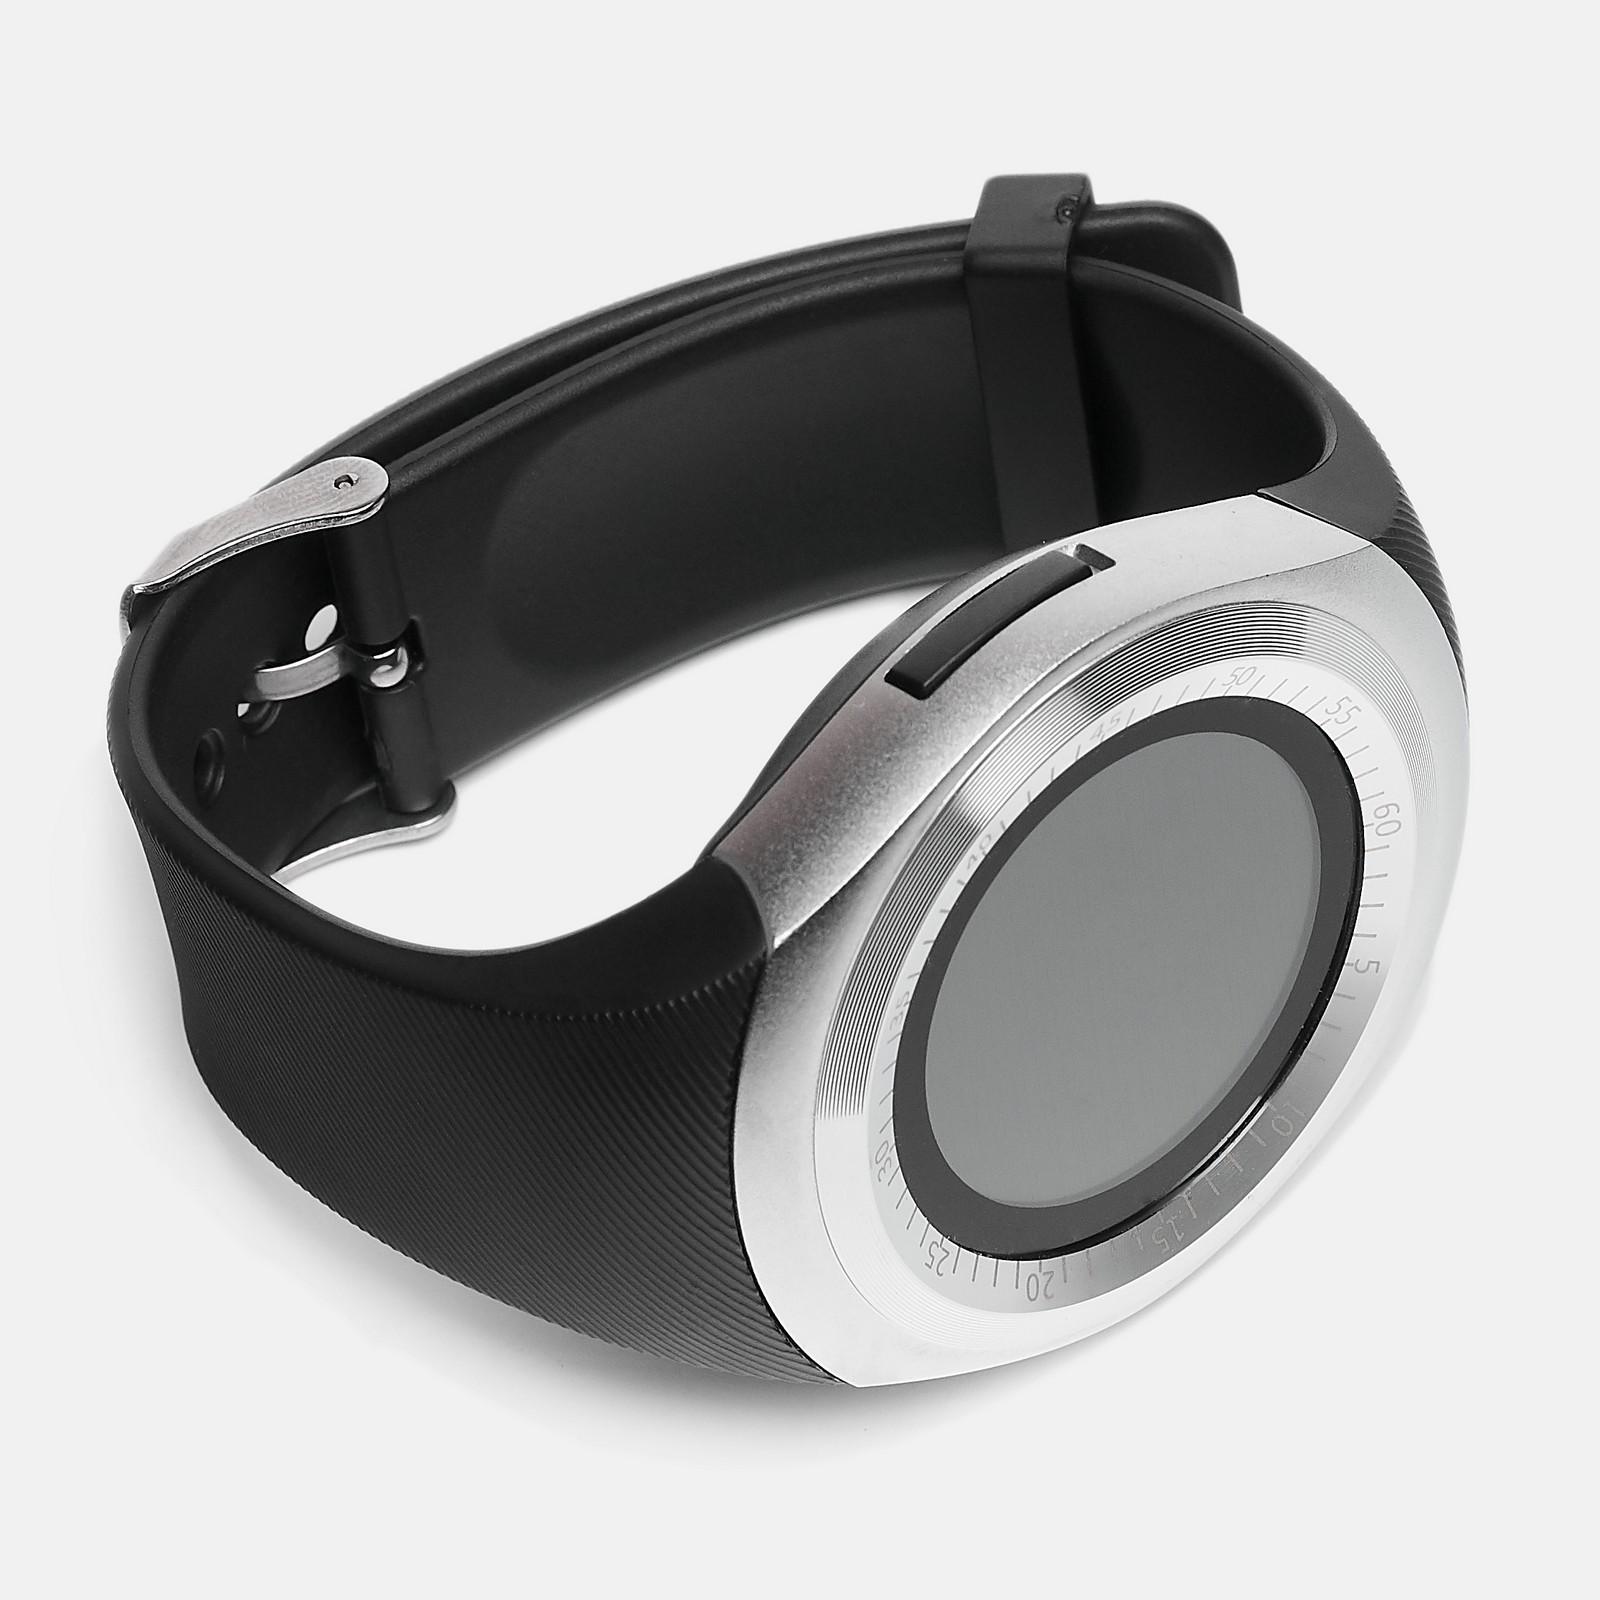 Умные часы Uwatch Y1 Silver